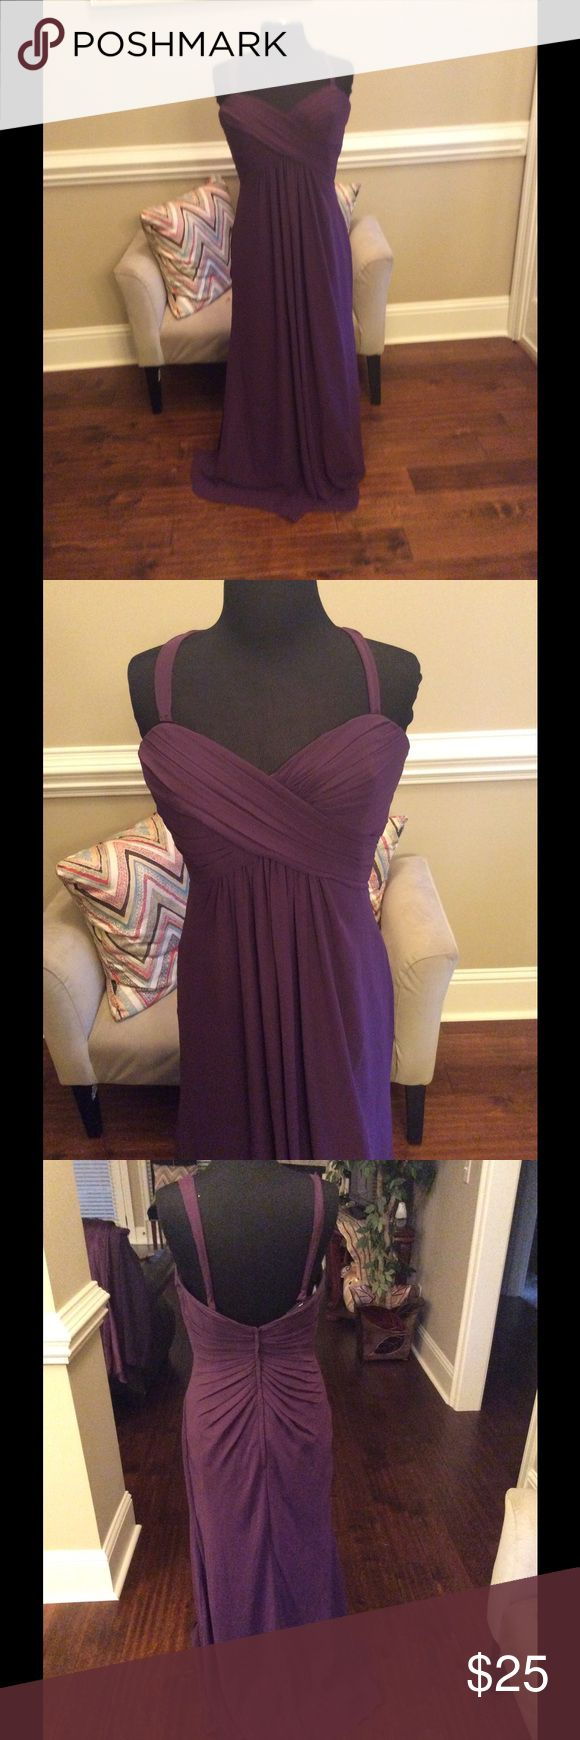 Eggplant chiffon formal gown Eggplant chiffon formal gown. Runs small fits a size 8 perfect Bari Jay Dresses Wedding